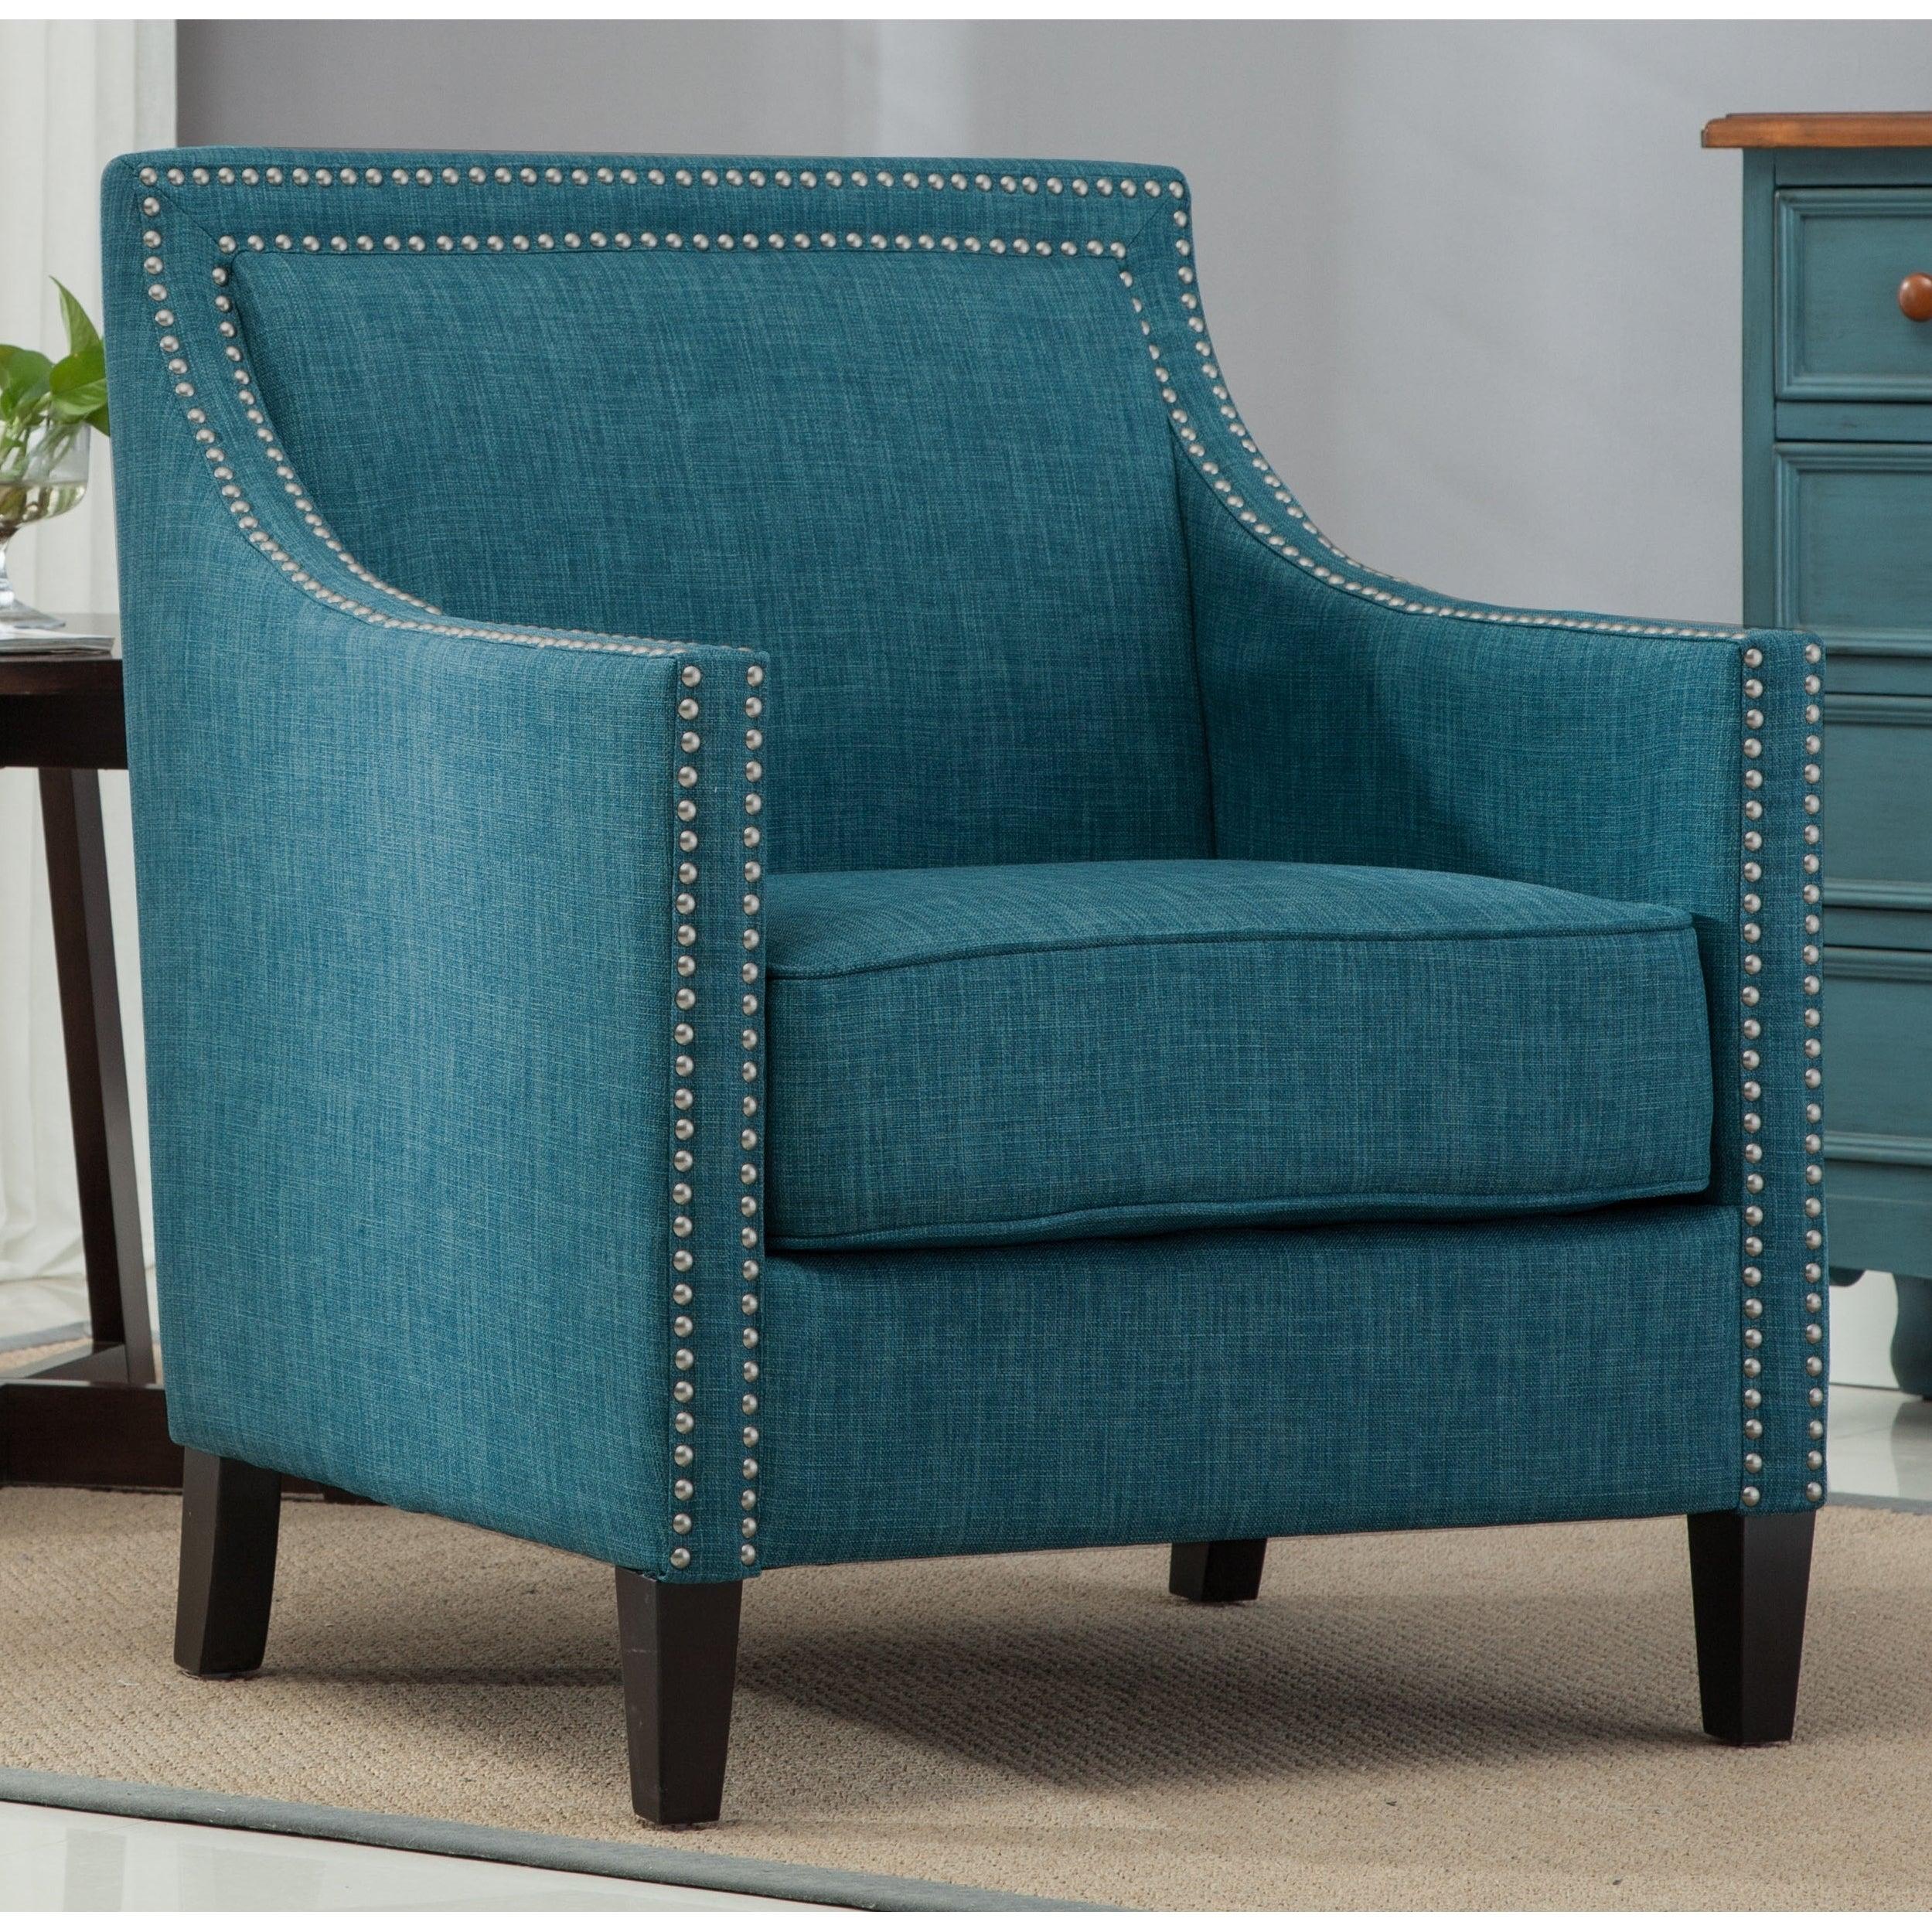 Fine Strick Bolton Earnshaw Teal Accent Chair Lamtechconsult Wood Chair Design Ideas Lamtechconsultcom